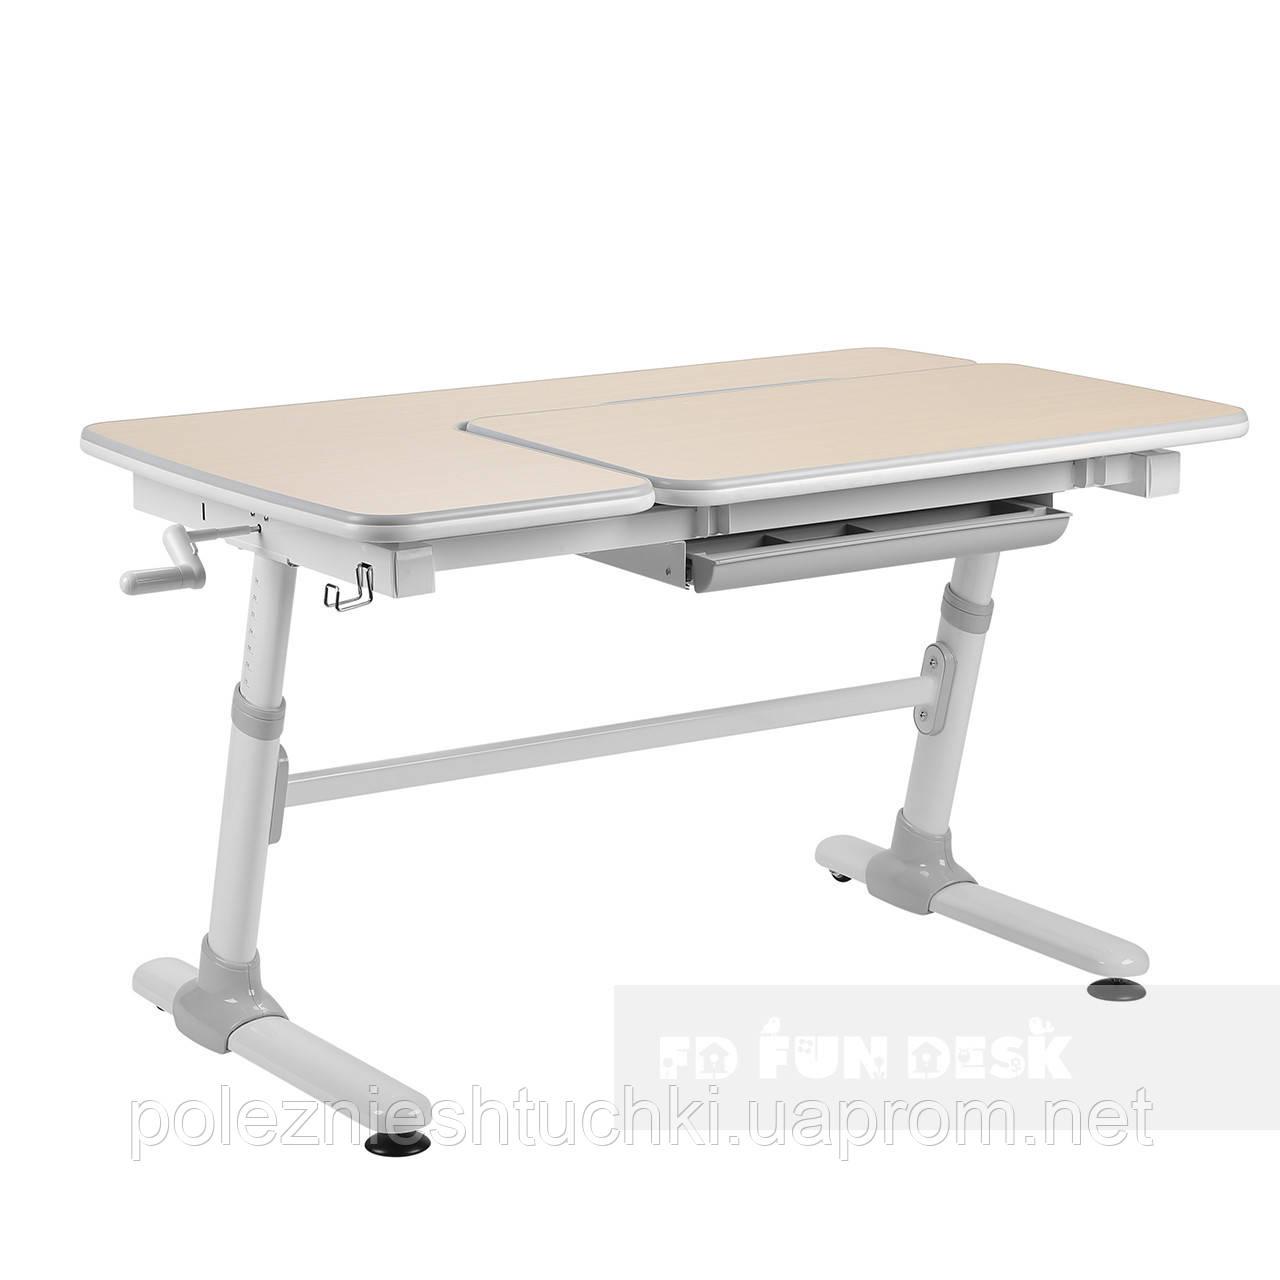 Ученический стол-трансформер FunDesk Invito Grey